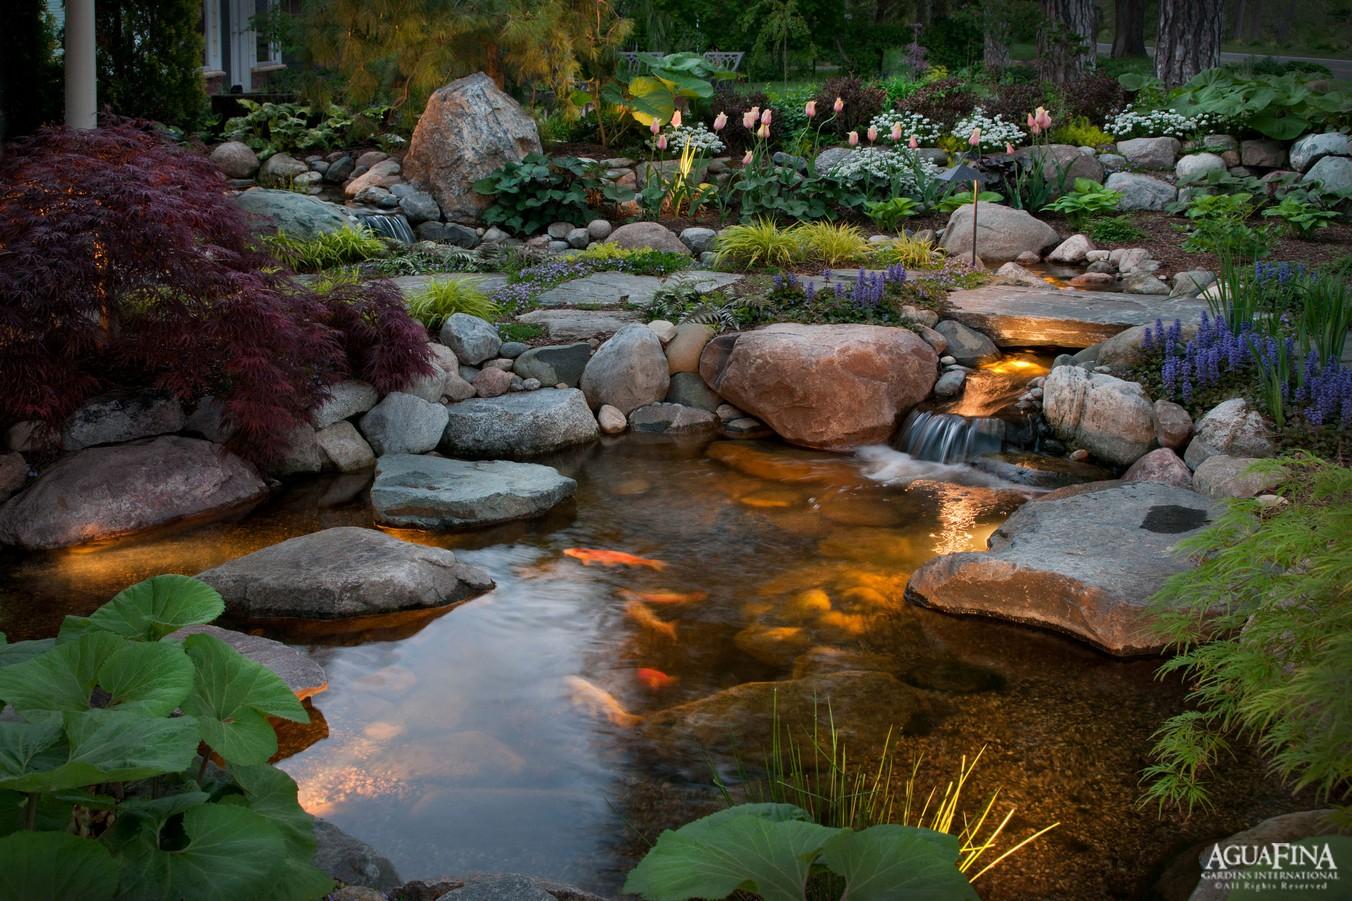 Aguafina Intimate Courtyard Pond